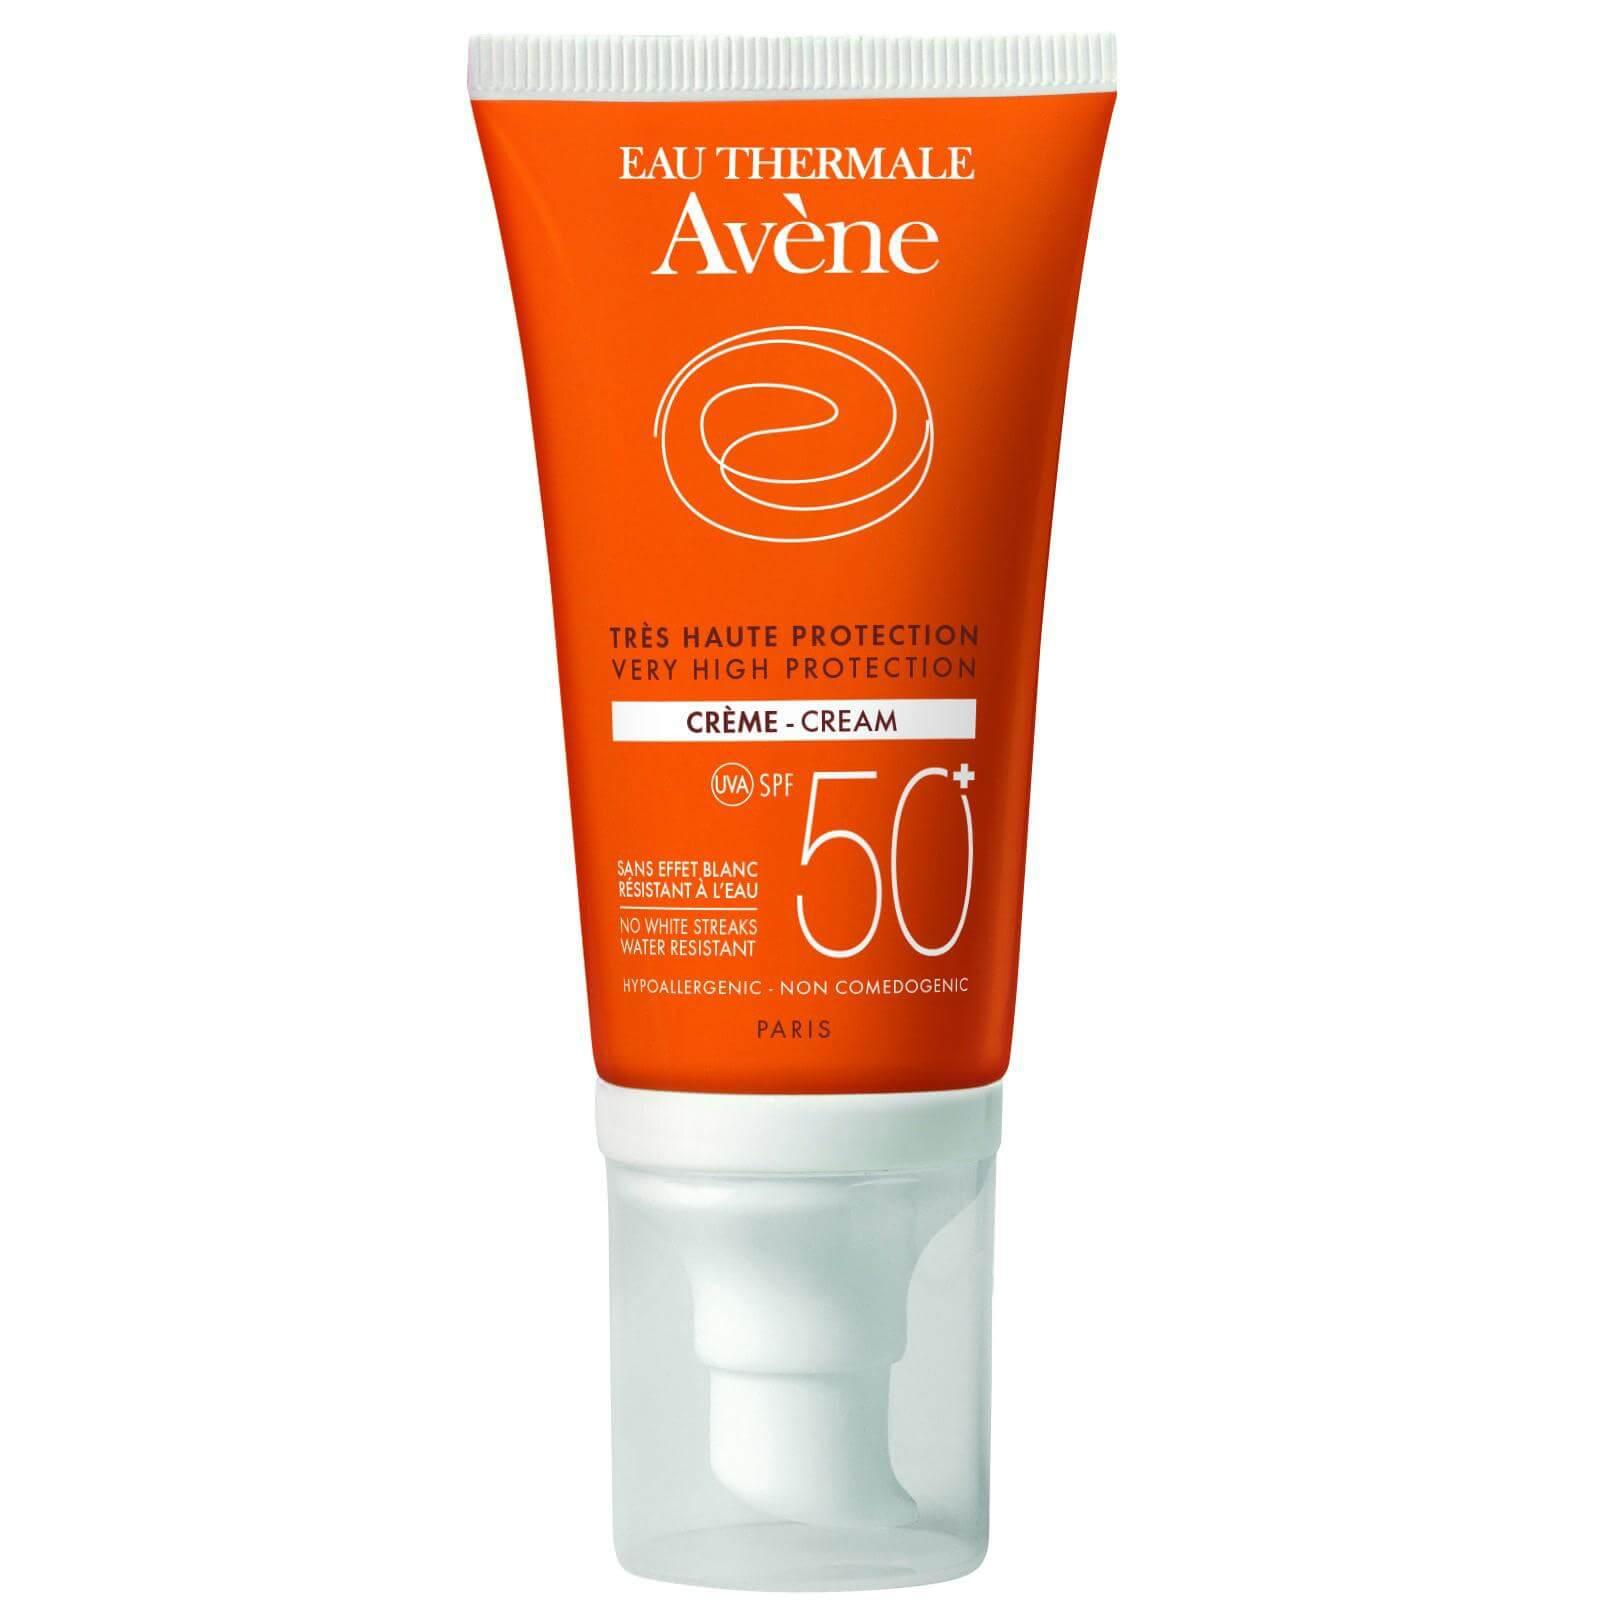 Avene Very High Protection Creme Spf50+ Αντηλιακή Κρέμα Προσώπου Πολύ Υψηλής Προστασίας 50ml – Χωρίς άρωμα